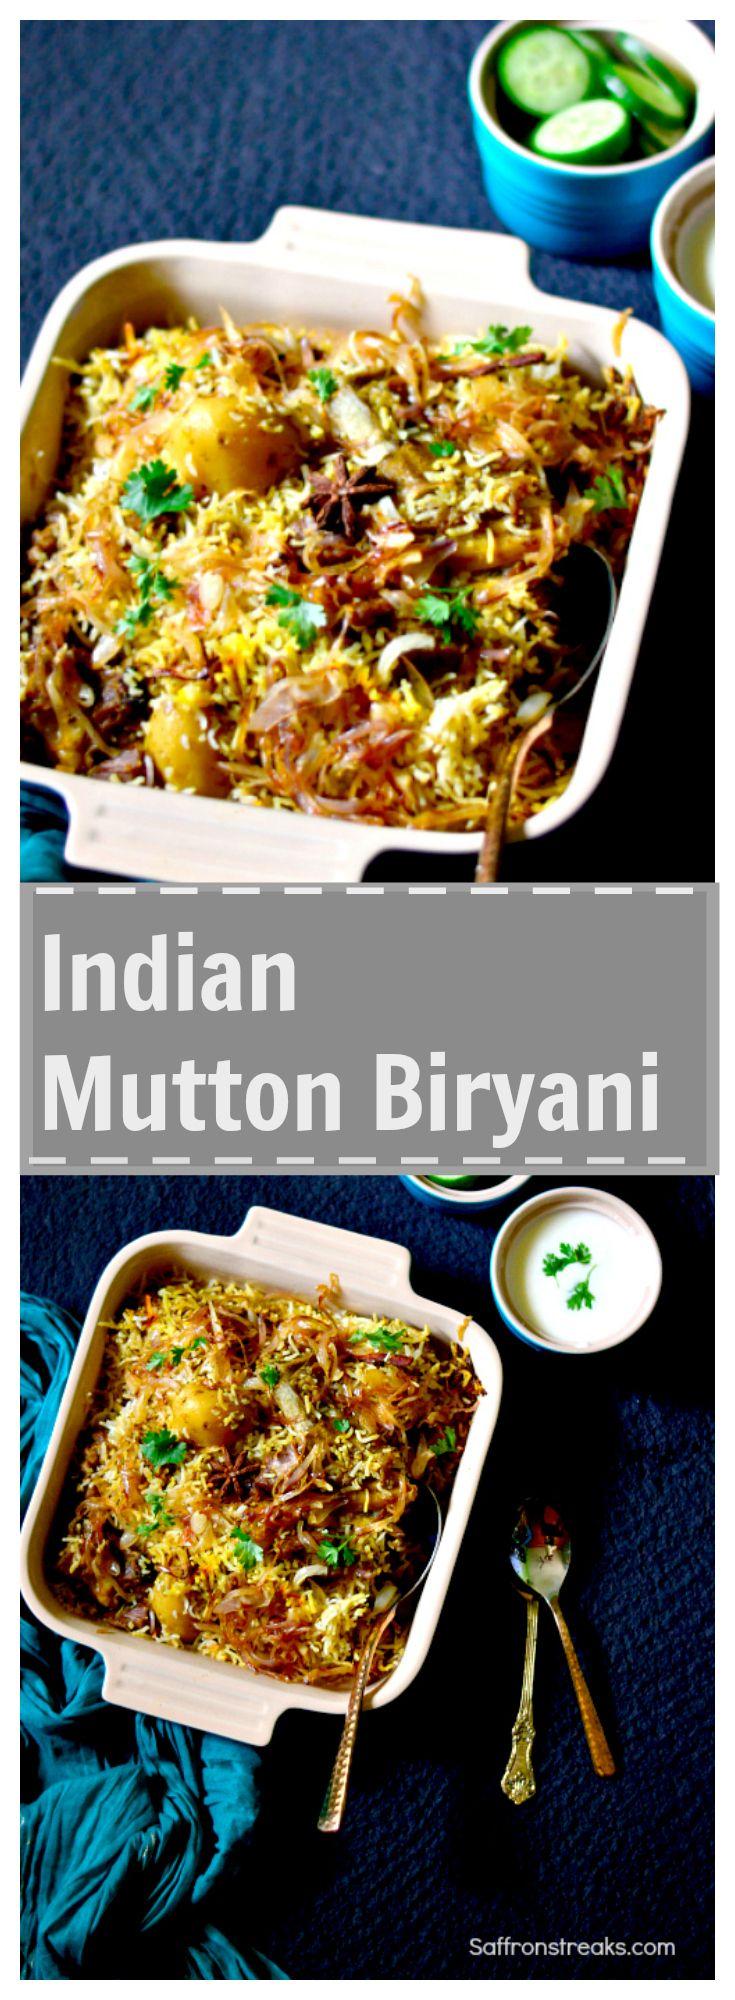 Indian (Lucknowi / Awadhi) Mutton Biryani recipe #Biryani #ricedish Succulent pieces of meat dum cooked in aromatic basmati rice